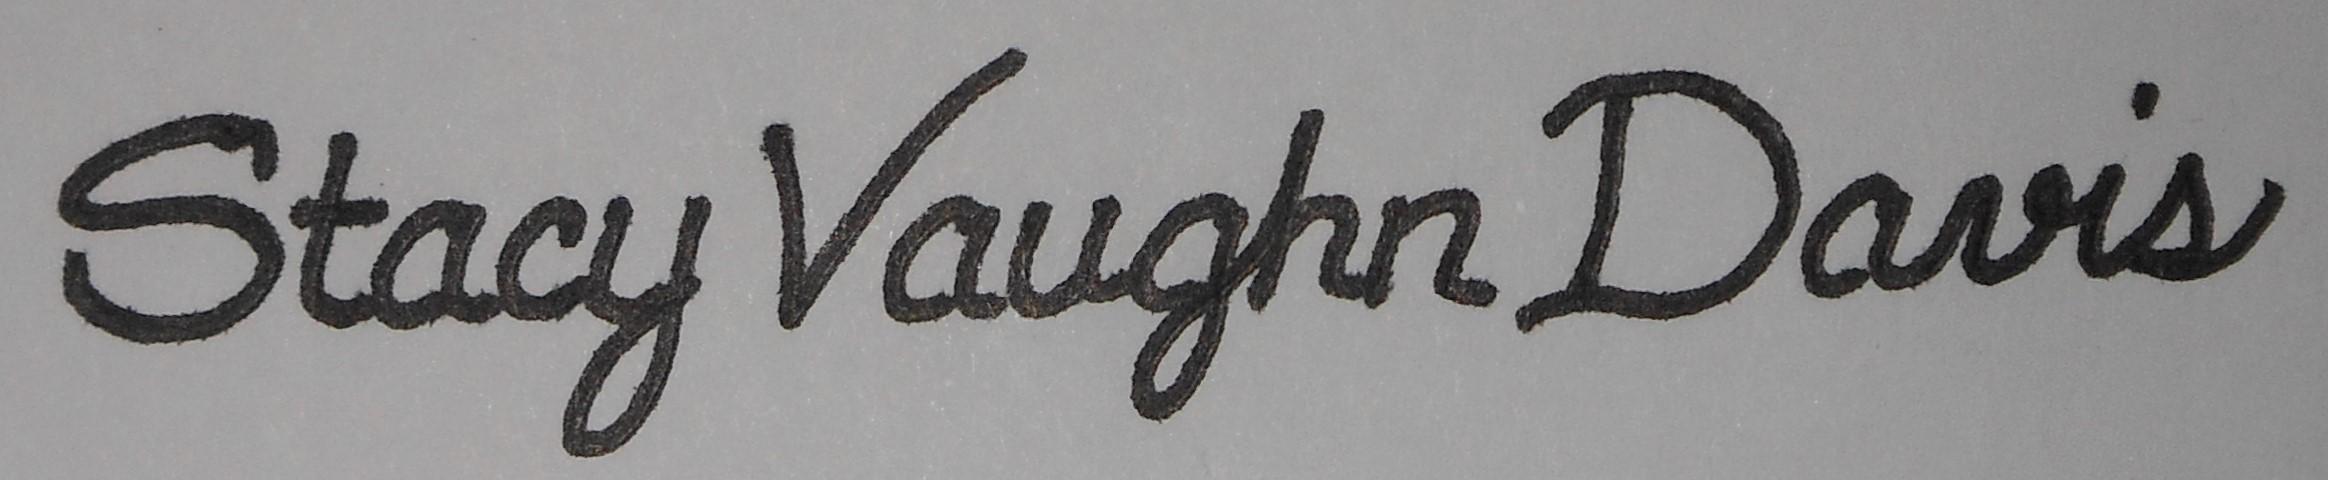 Stacy Davis Signature